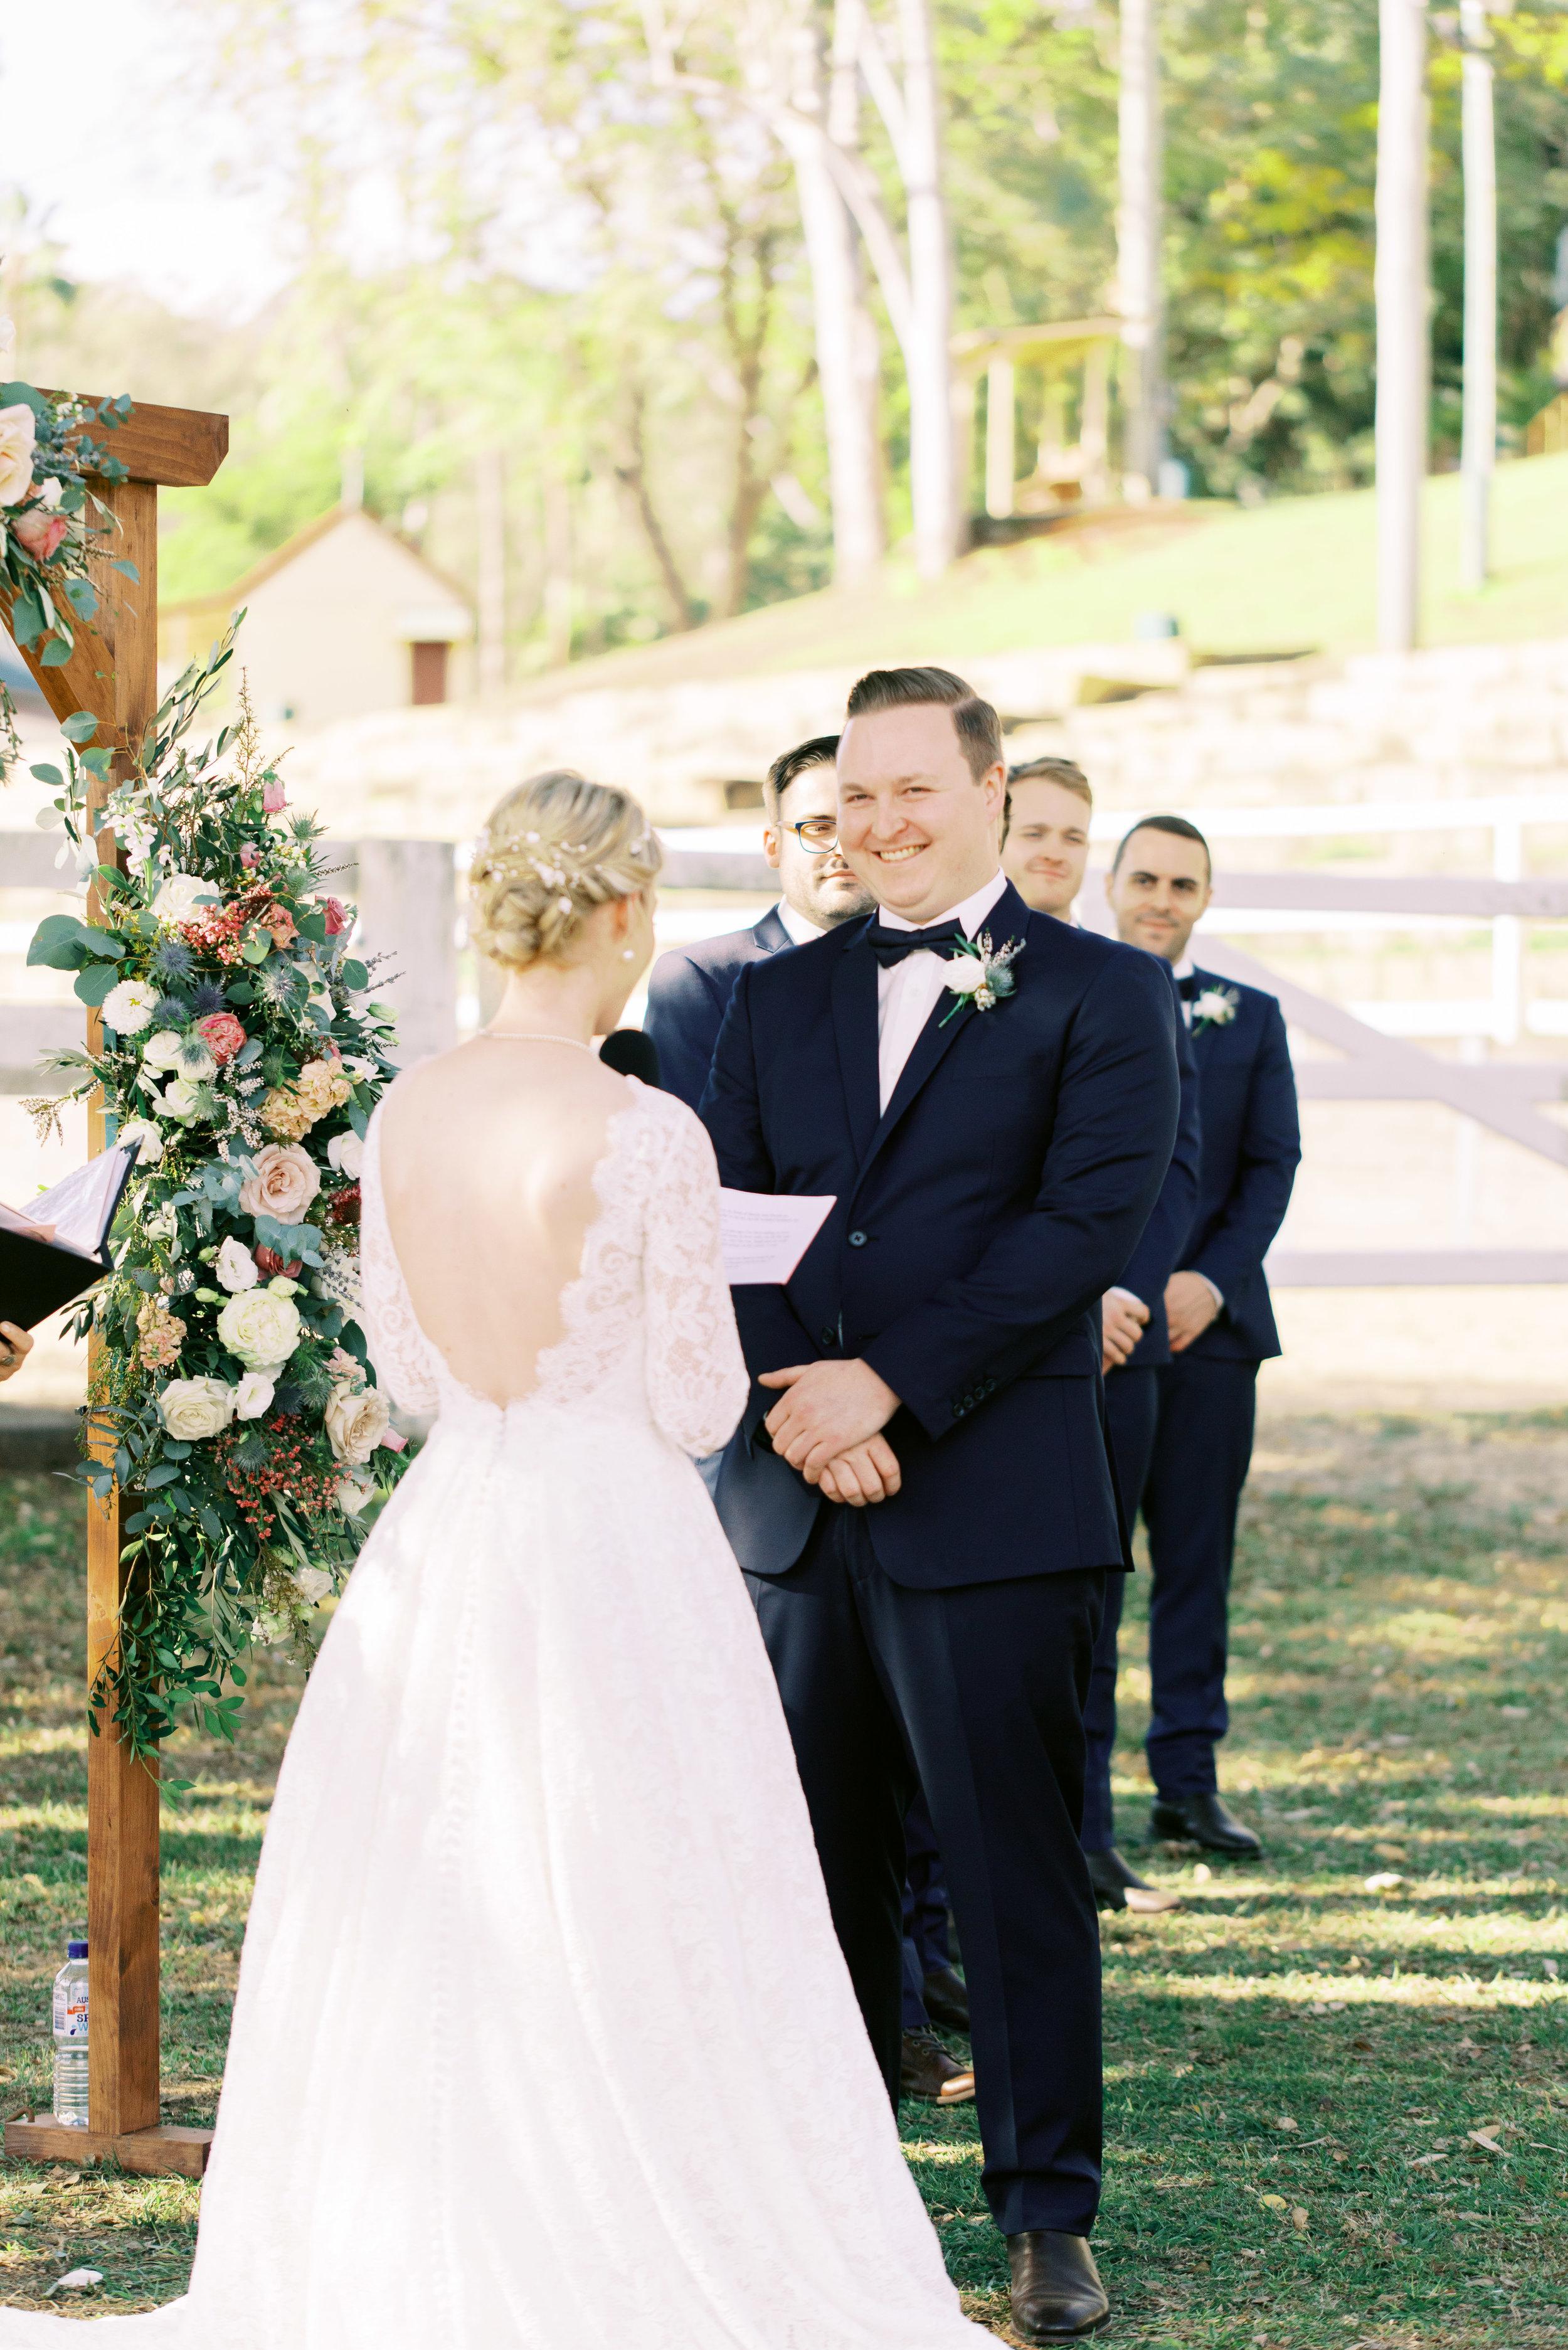 brisbane-gold-coast-sunshine-coast-tweed-romantic-fine-art-wedding-photography-lauren-olivia-27.jpg